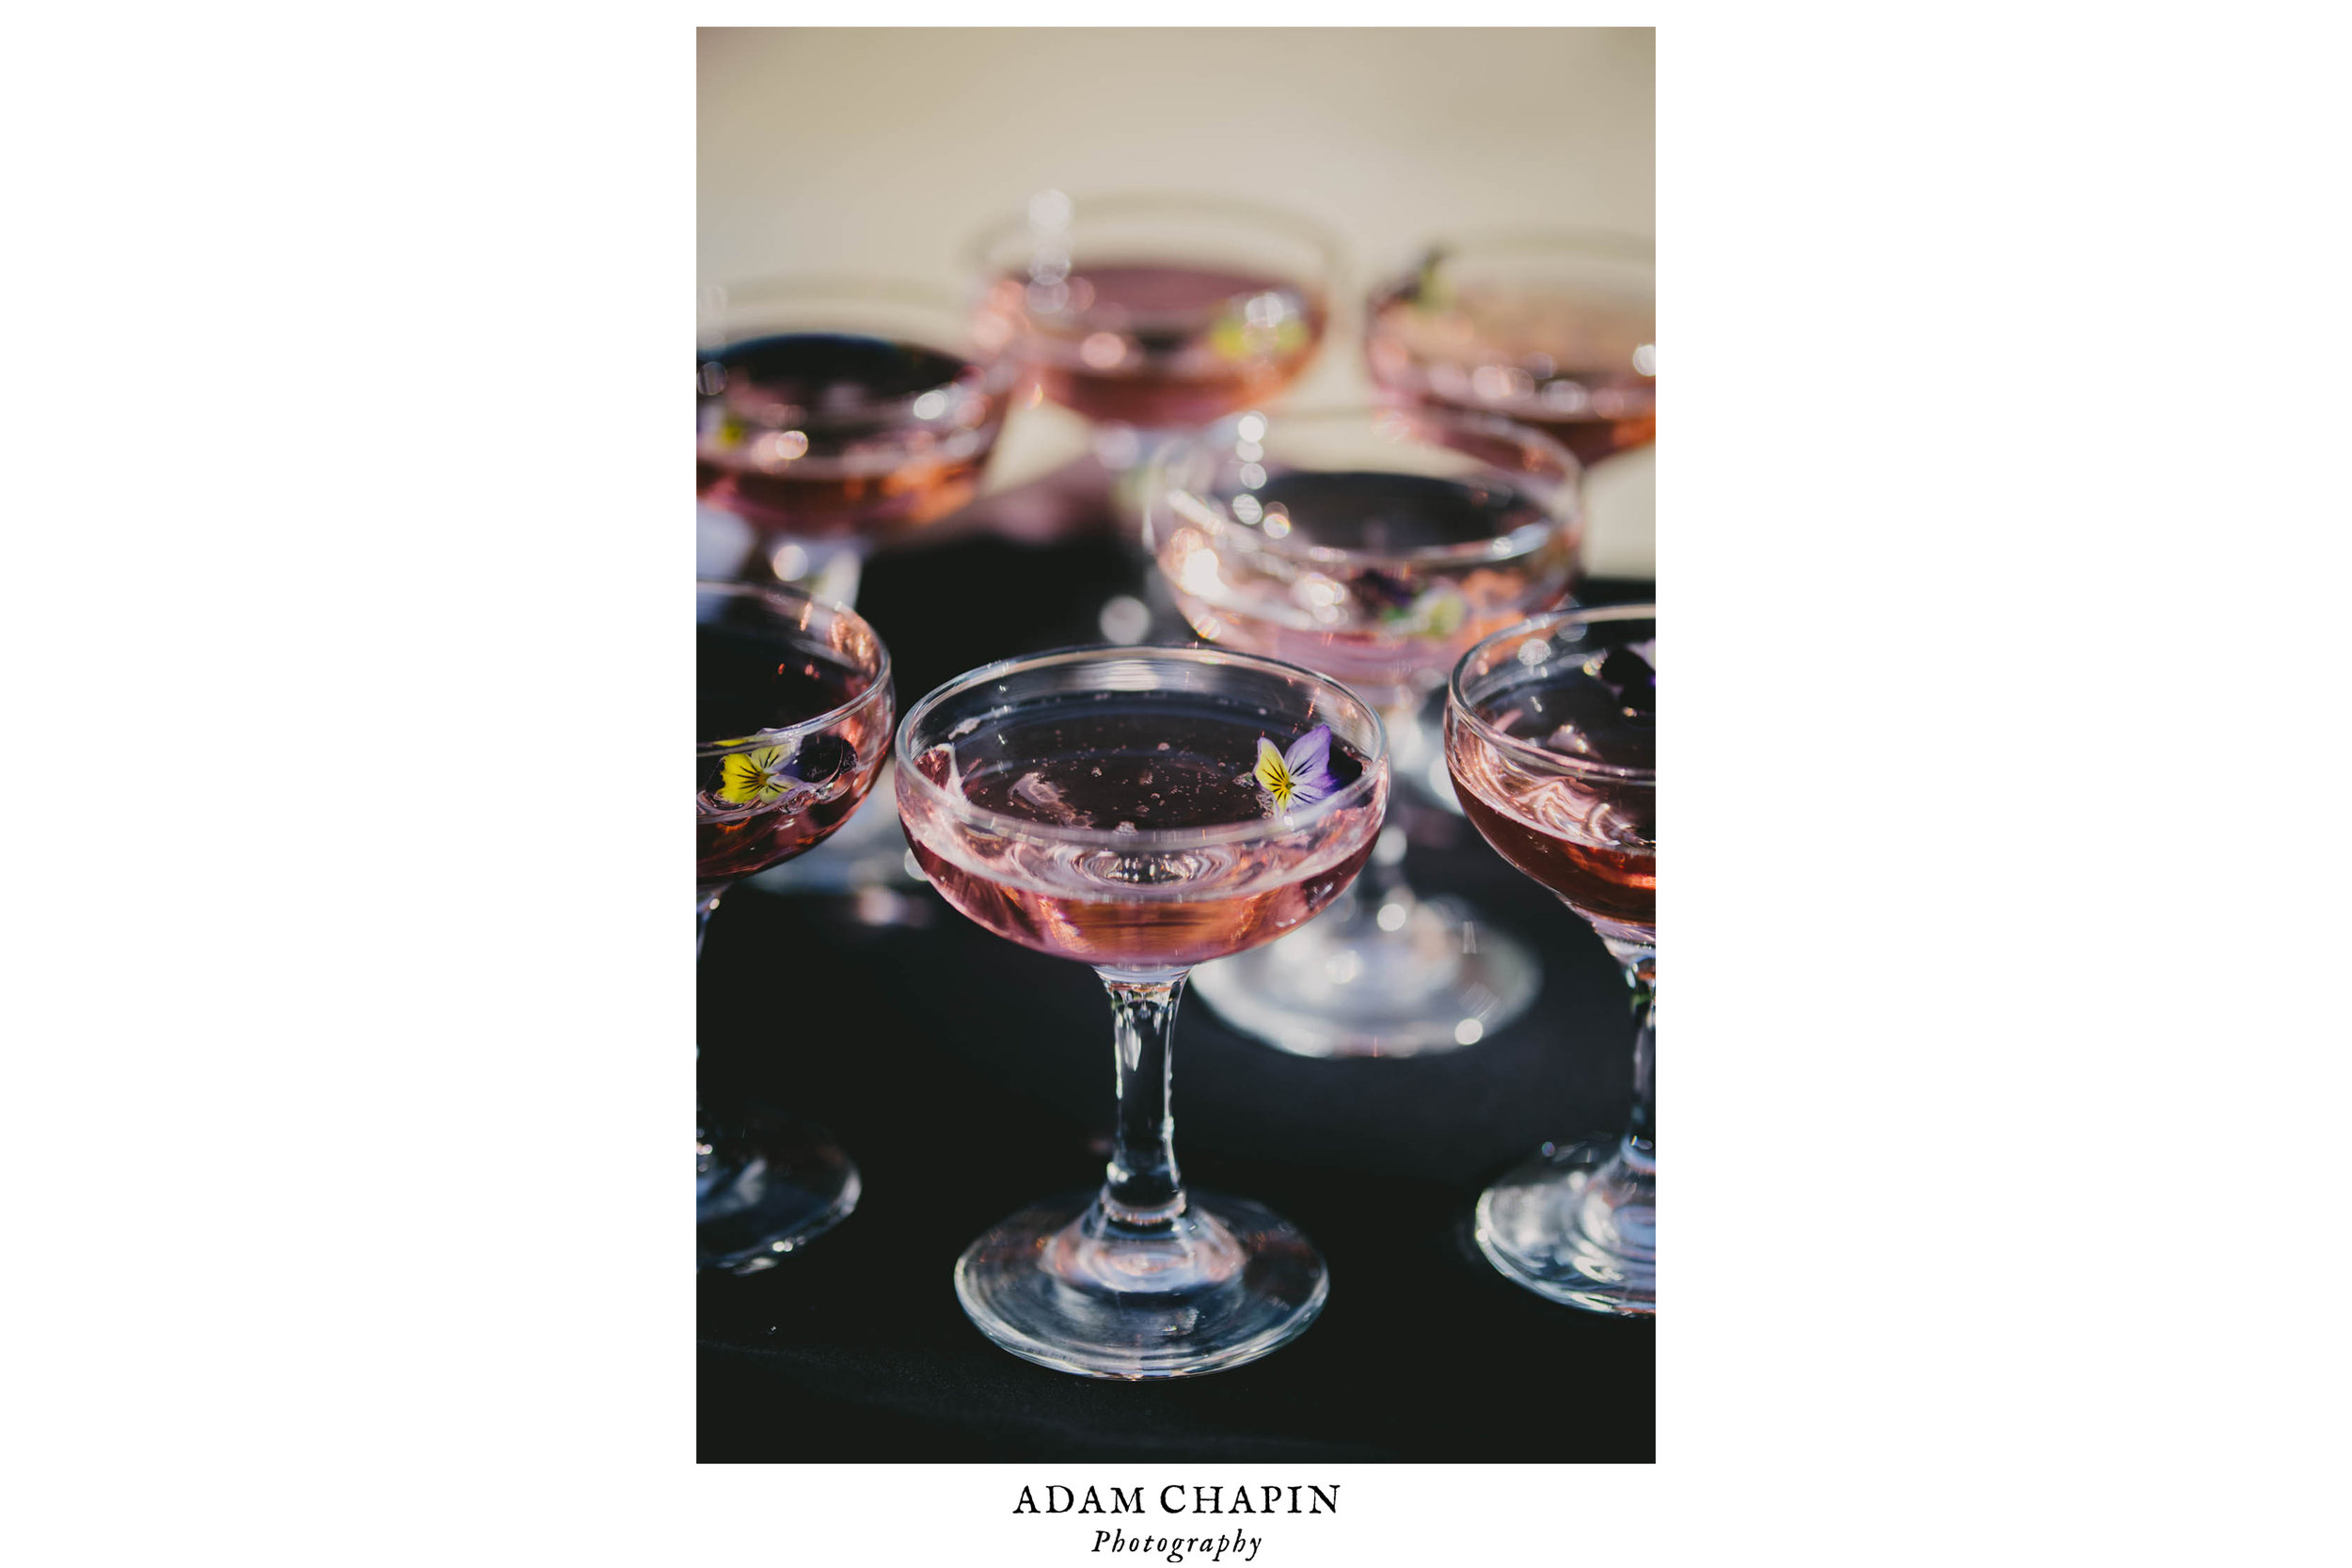 custom-cocktails-at-this-enchanted-garden-summer-wedding-at-the-graylyn.jpg